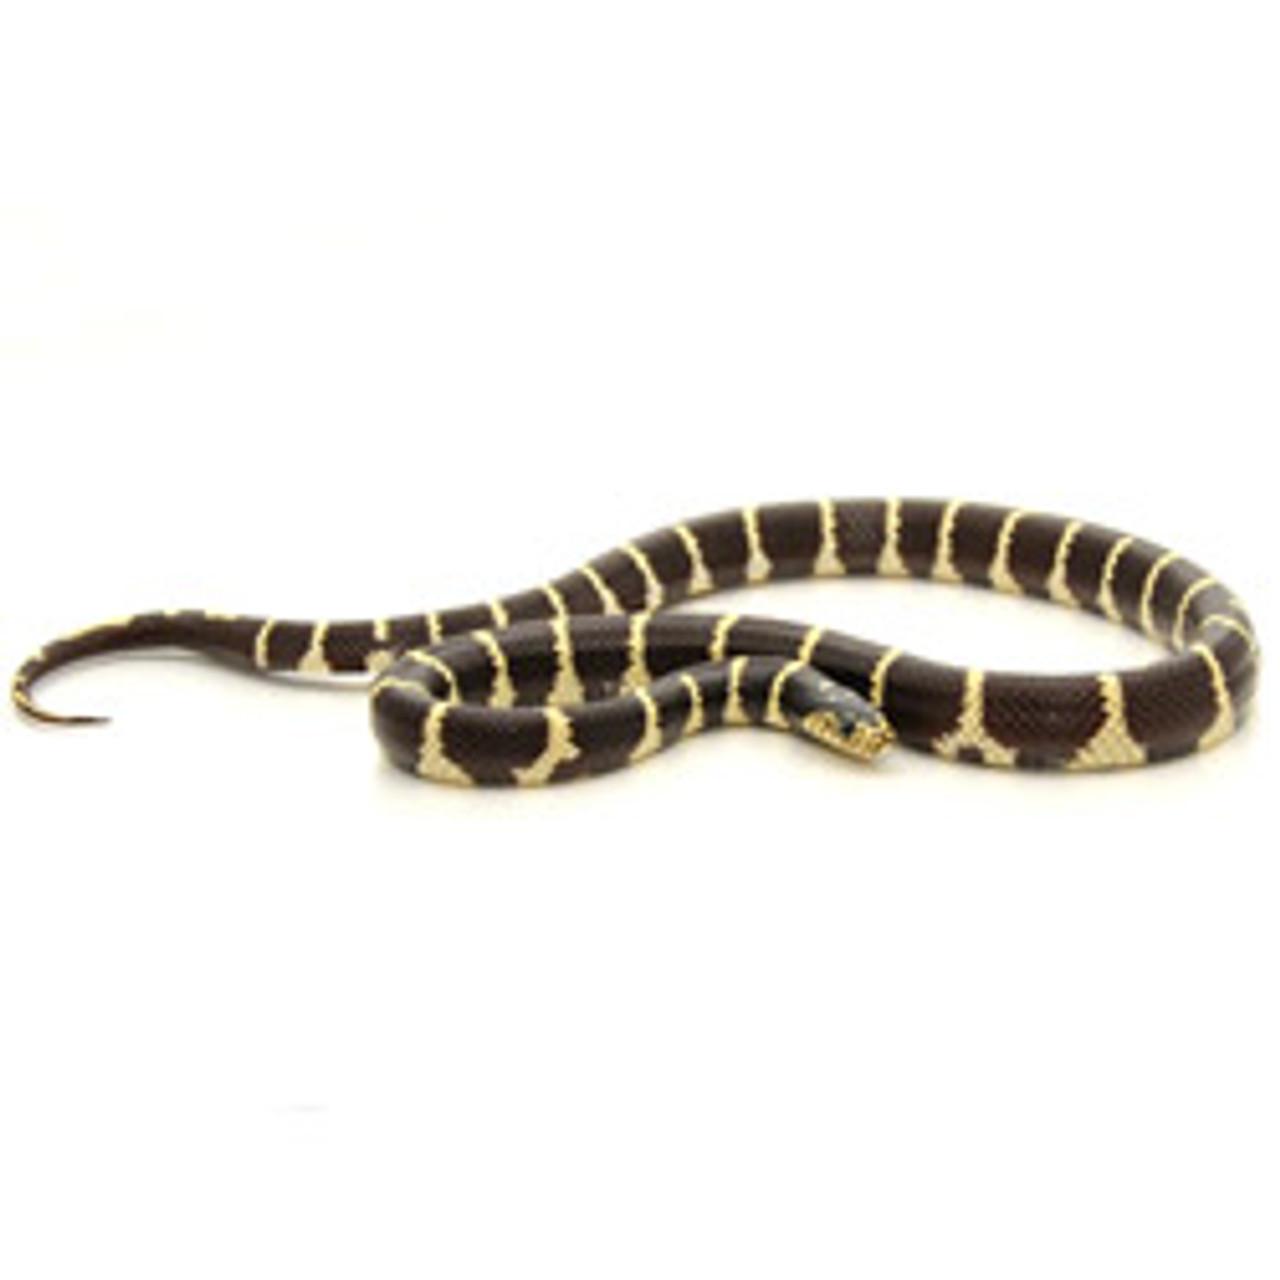 California King Snake (Lampropeltis getula)